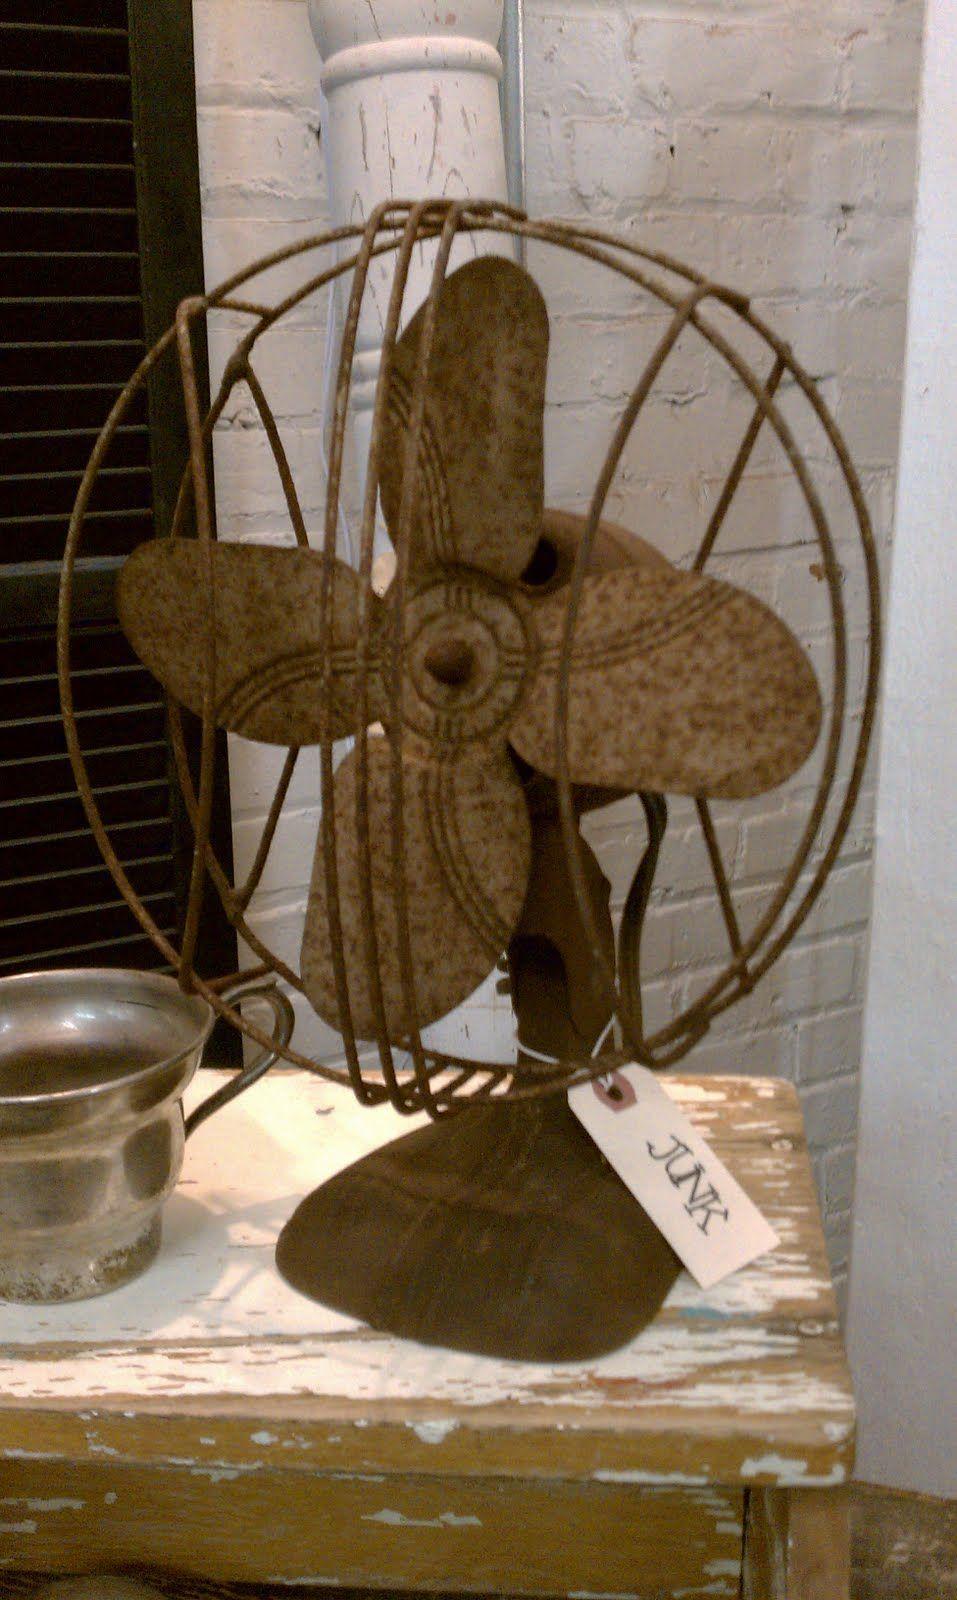 Vintage Sears Roebuck And Co K Industrial Desk Fan Home Sweet 193039s Ge Table Needs Rewiring Fans Etsy Pinterest Antique